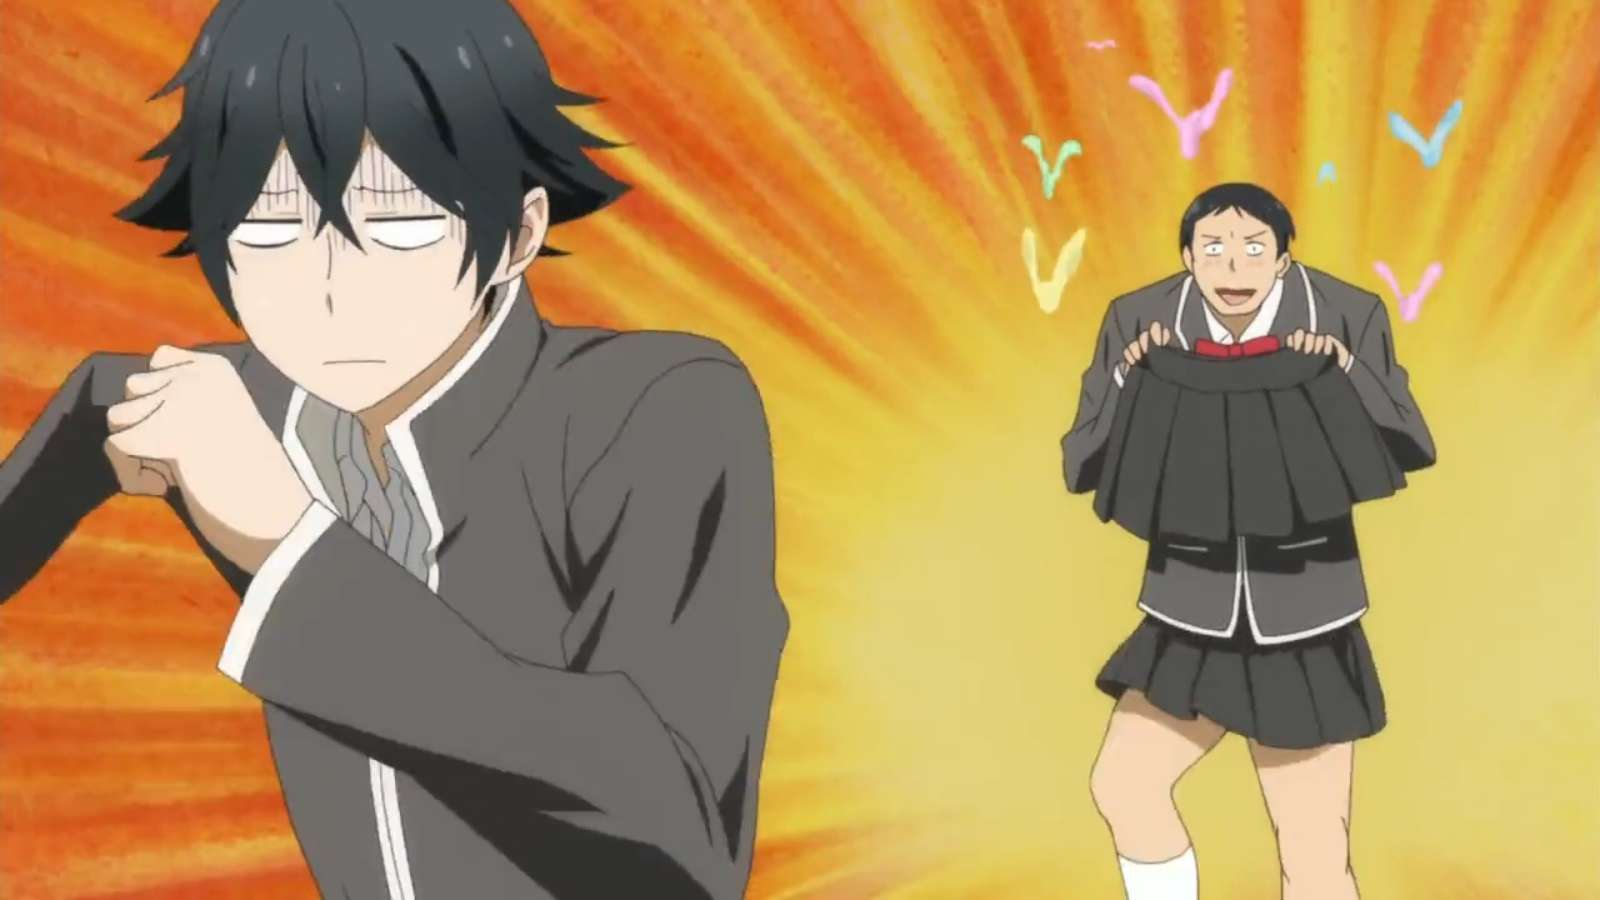 Ulasan Anime Handa Kun Lika Liku Kehidupan Seorang